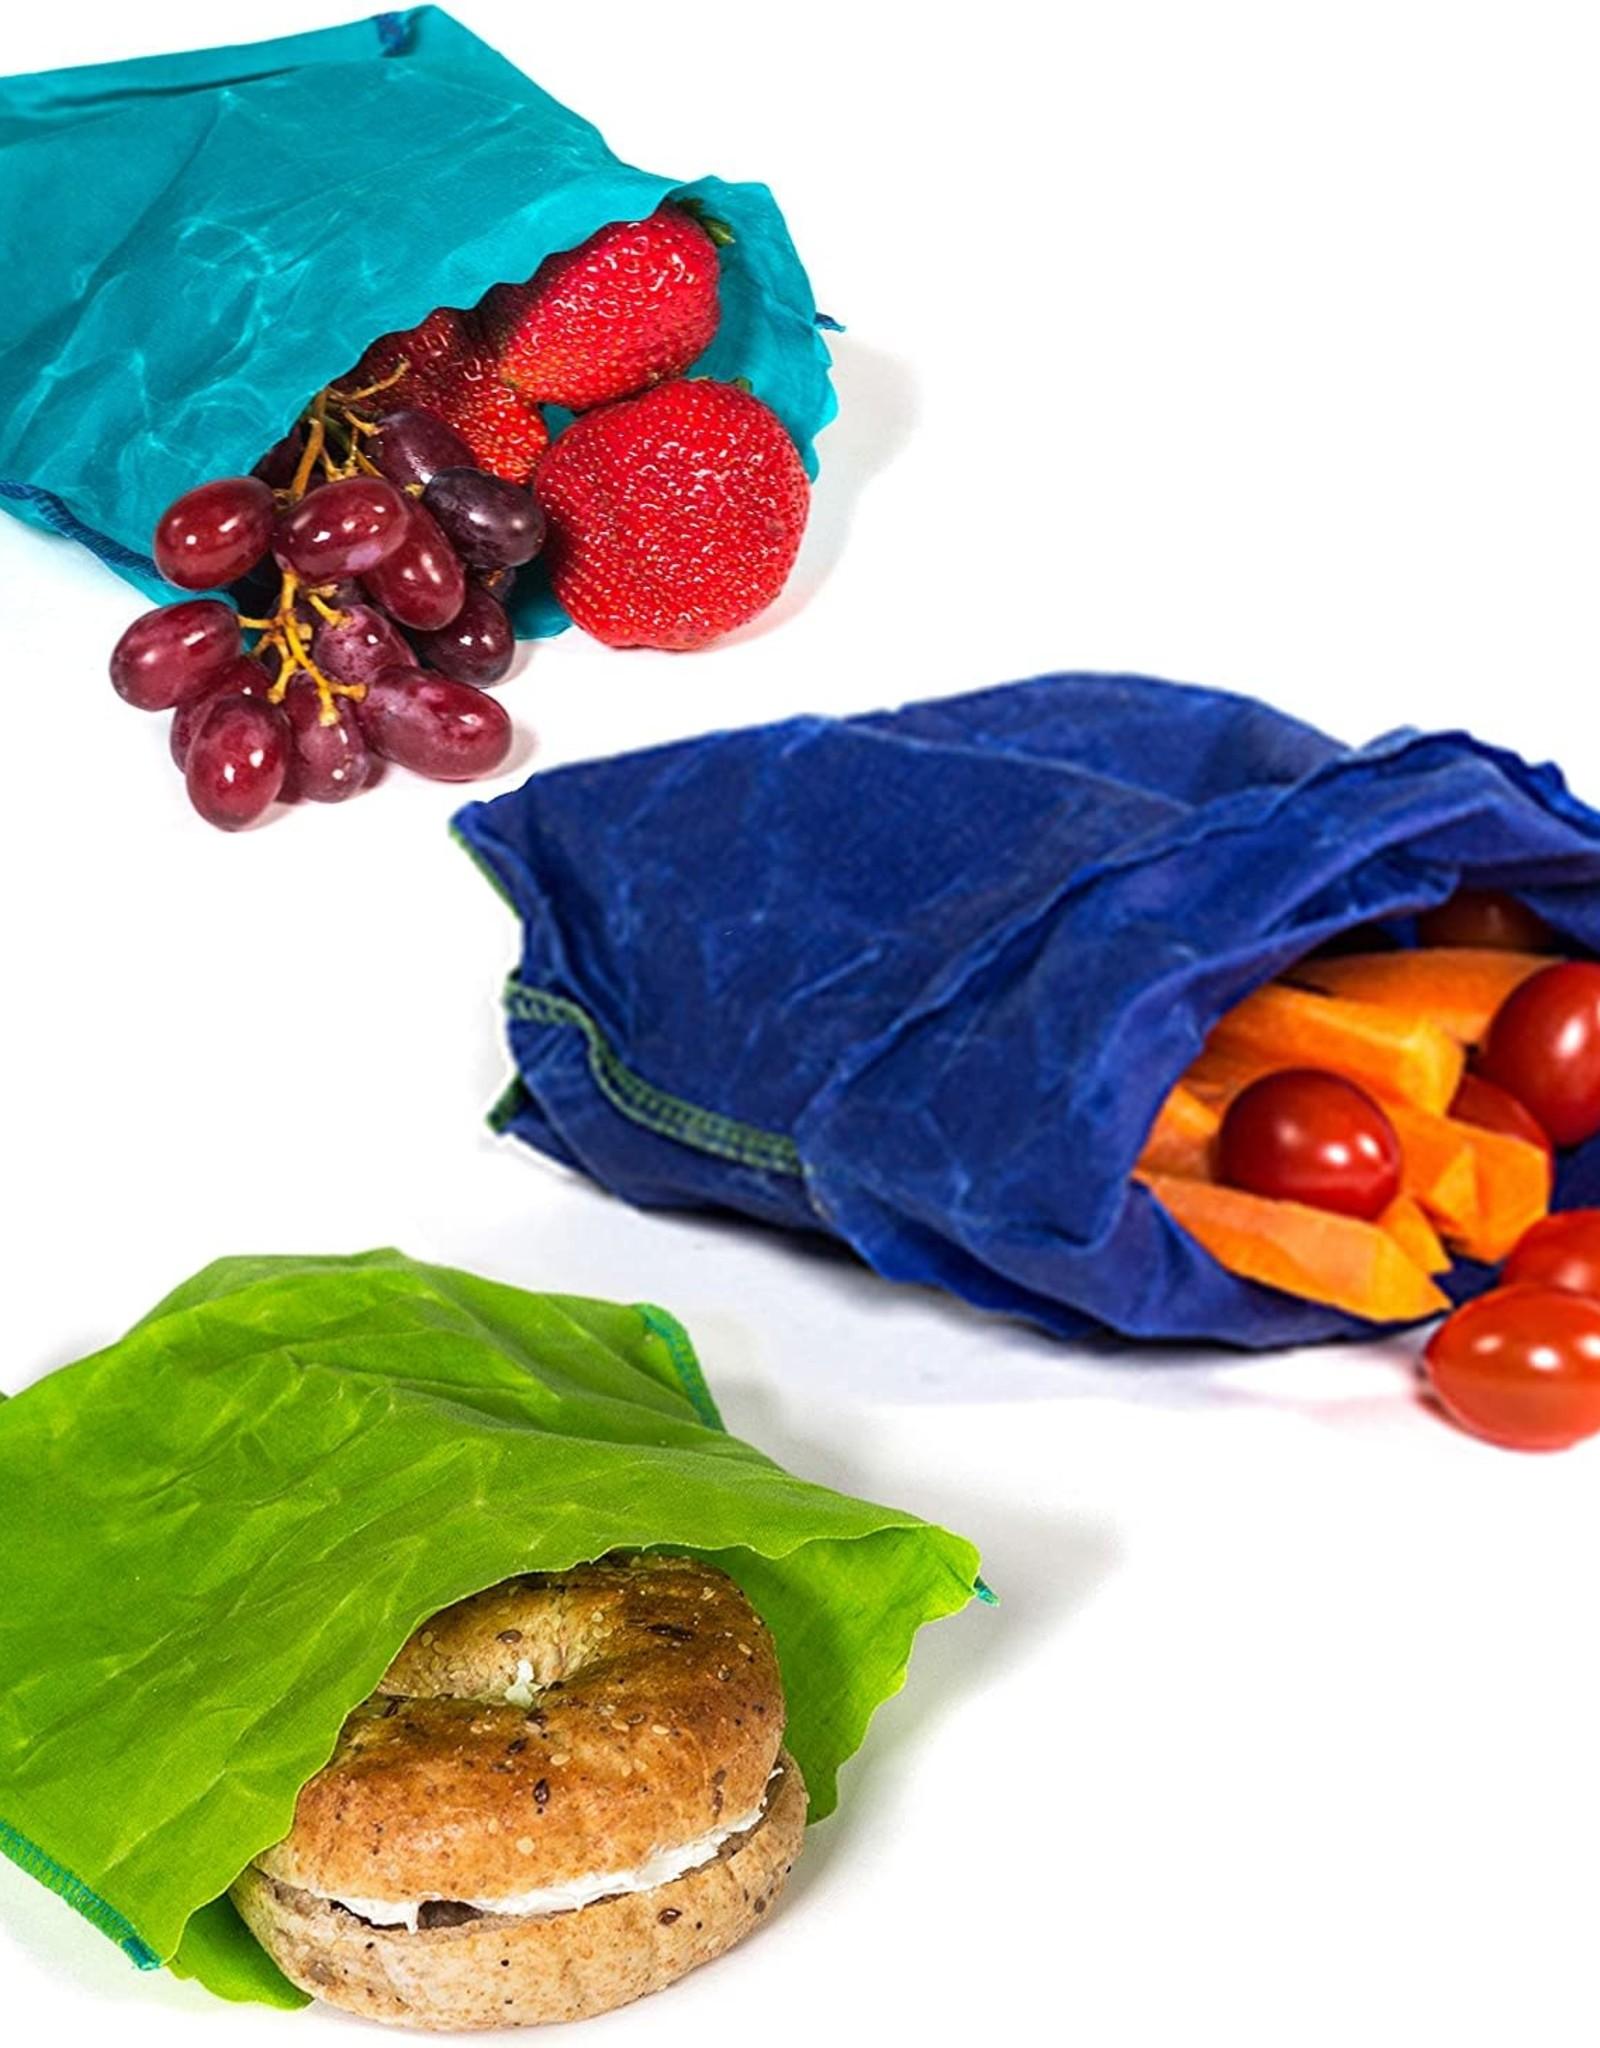 Etee Reusable Sandwich Bags